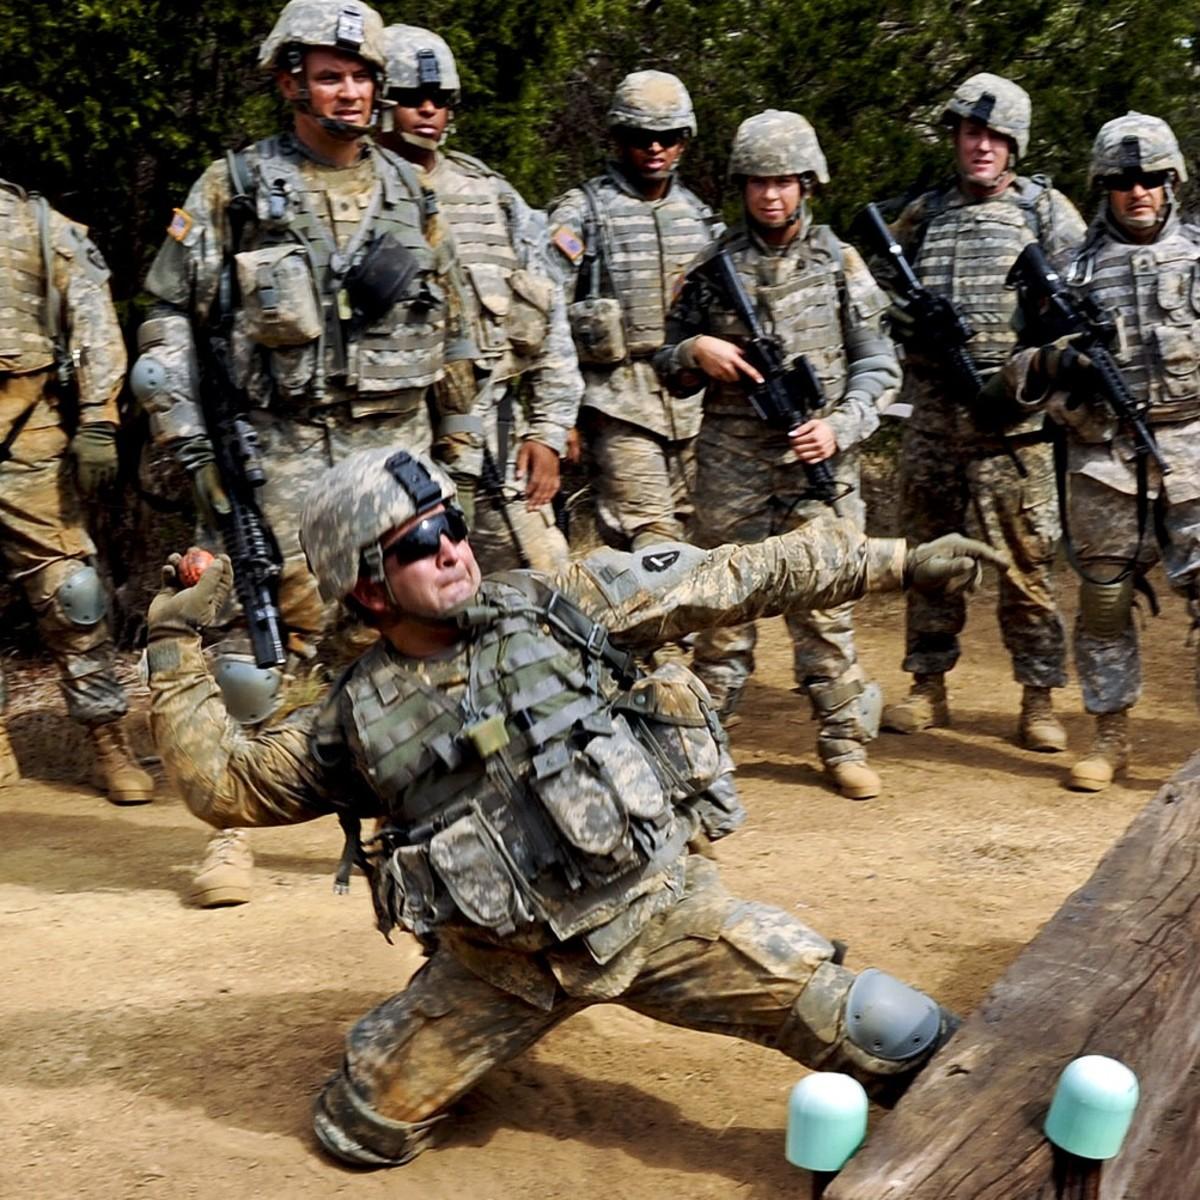 Grenade time